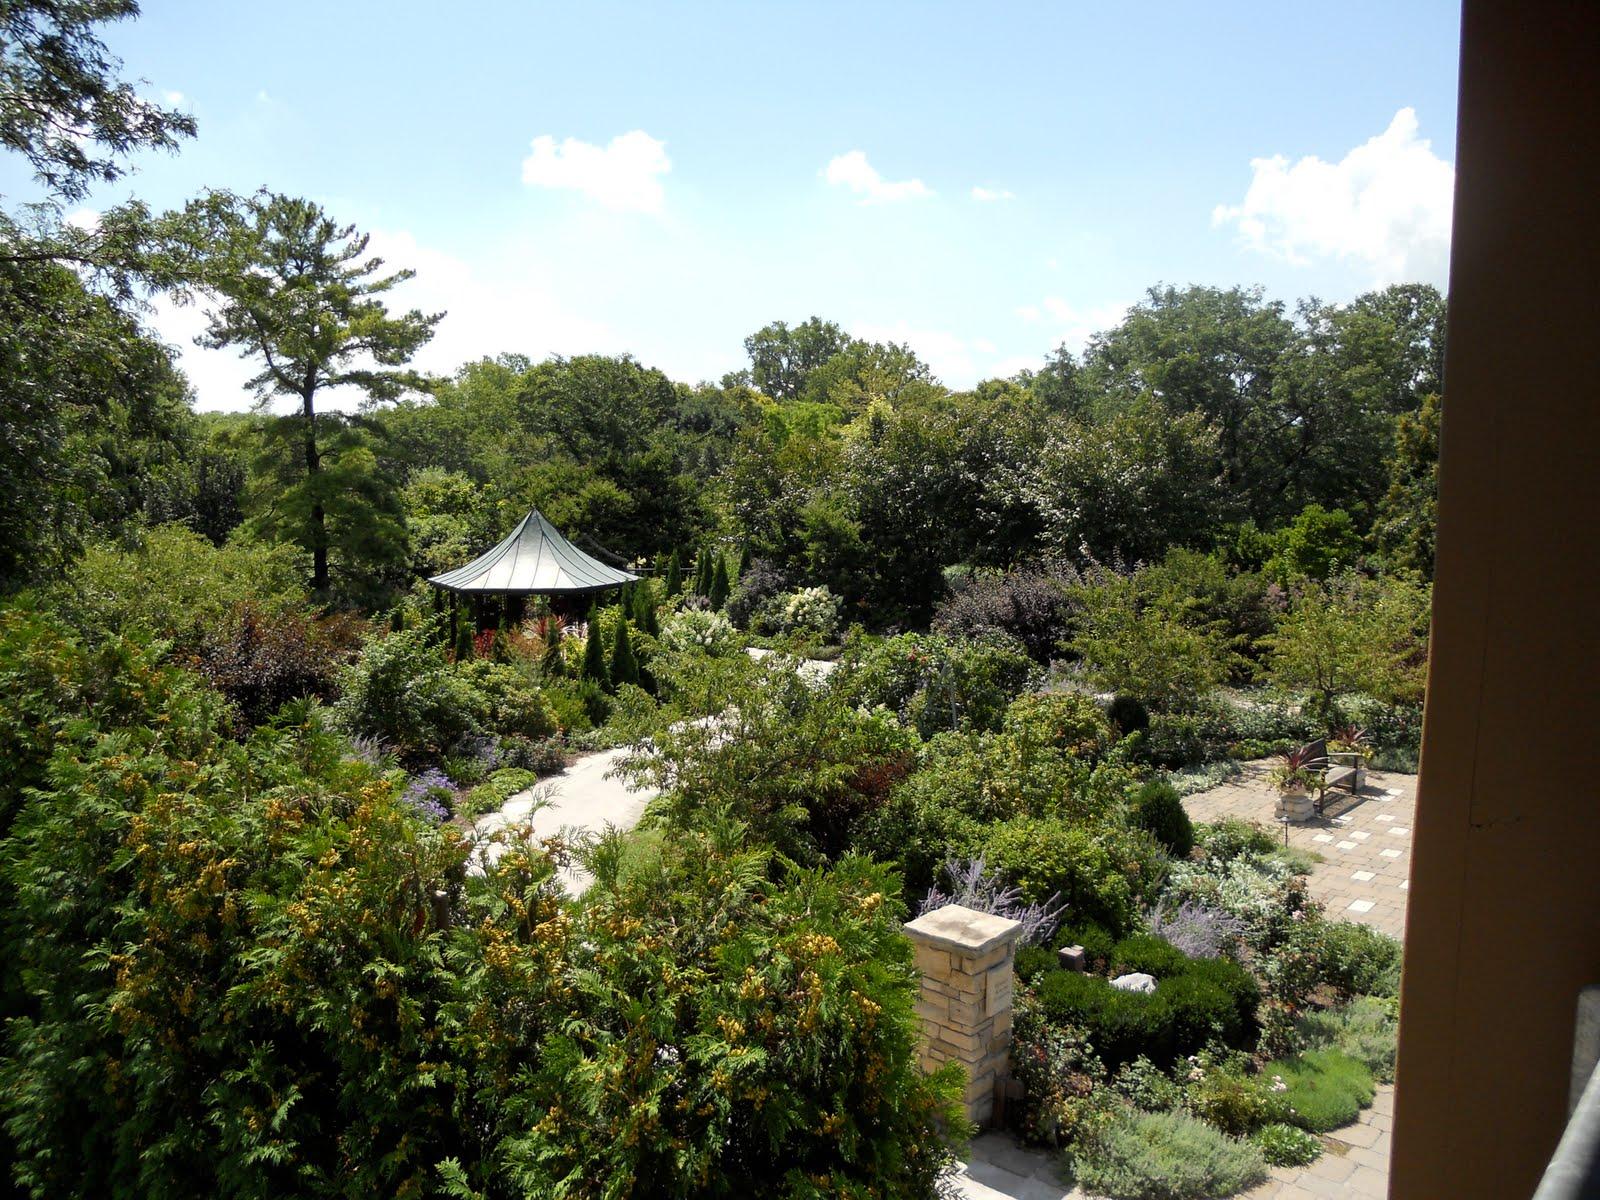 Connecticut Gypsies A Walk Through The Botanical Garden In Madison Wi